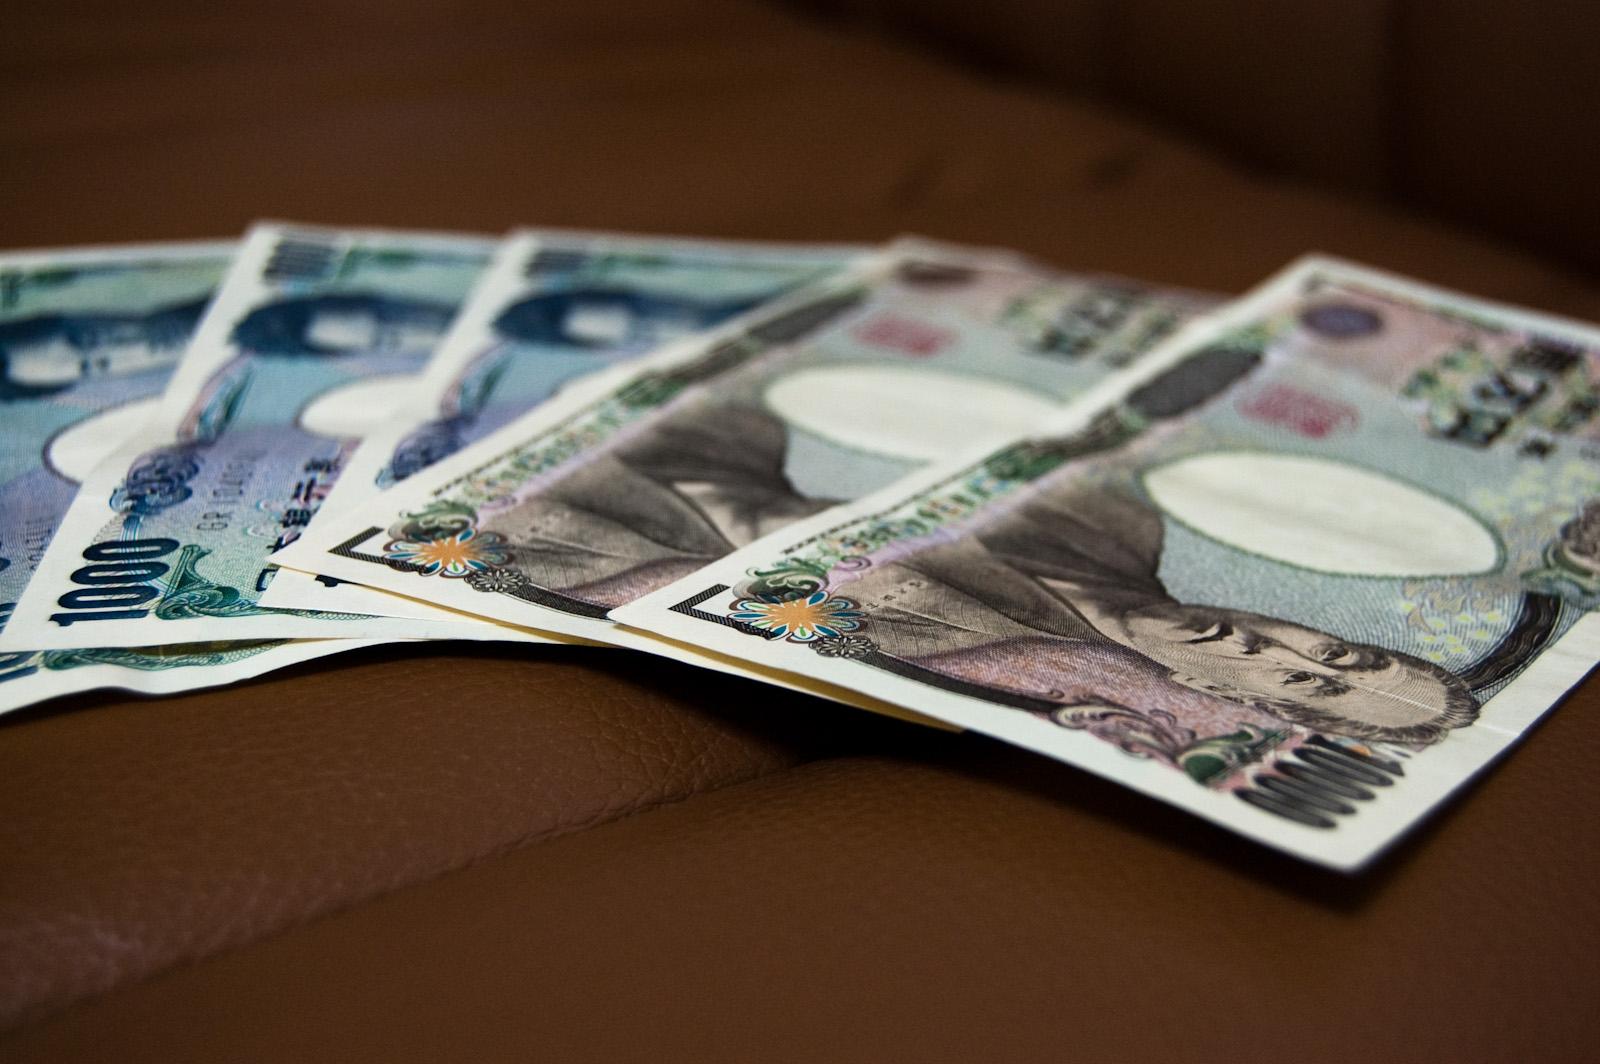 飛田新地の料金